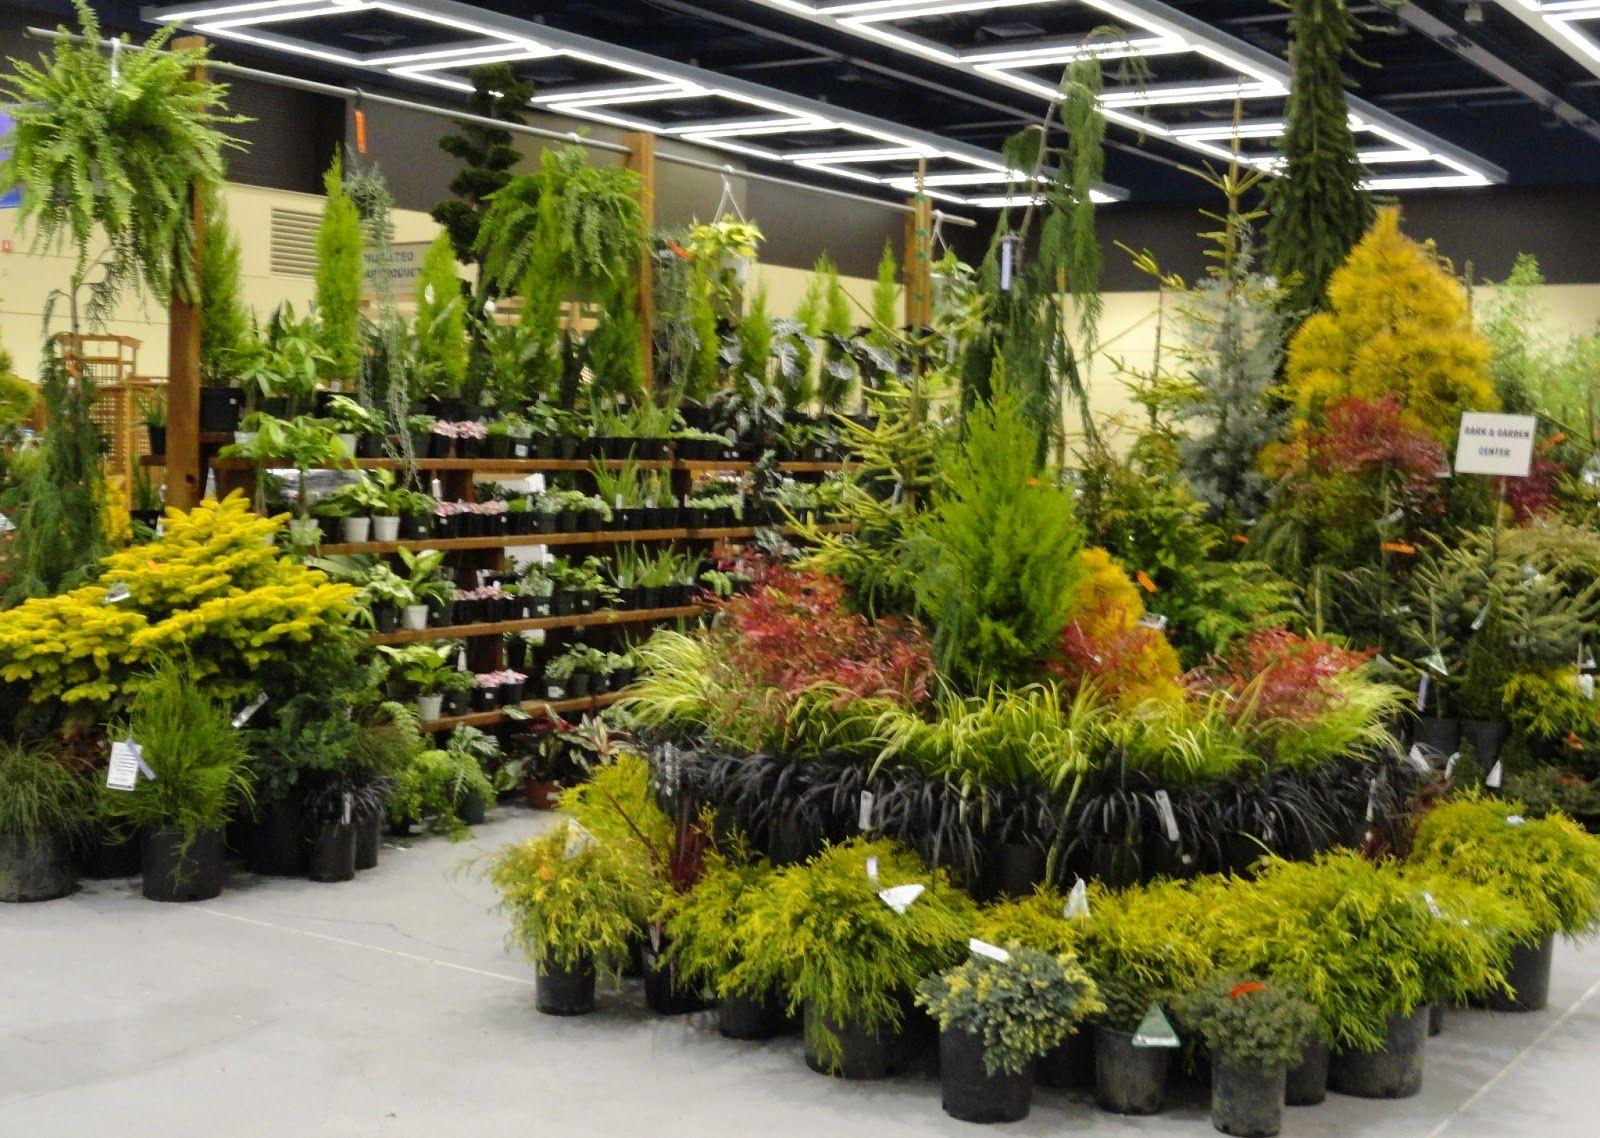 Garden Center Plant Display Ideas | Store display ideas | Pinterest ...